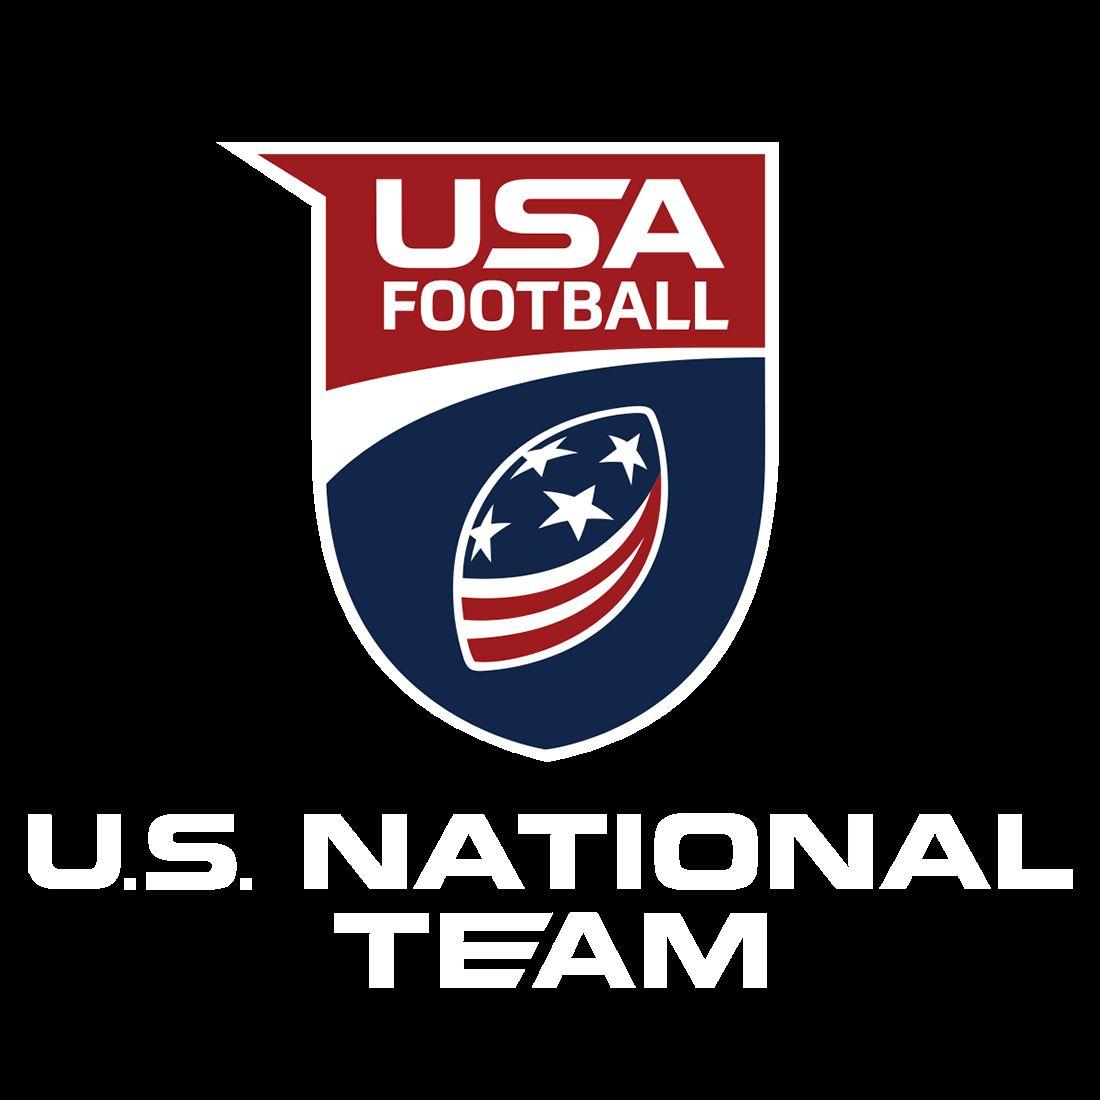 USA Football - Under-19 National Team